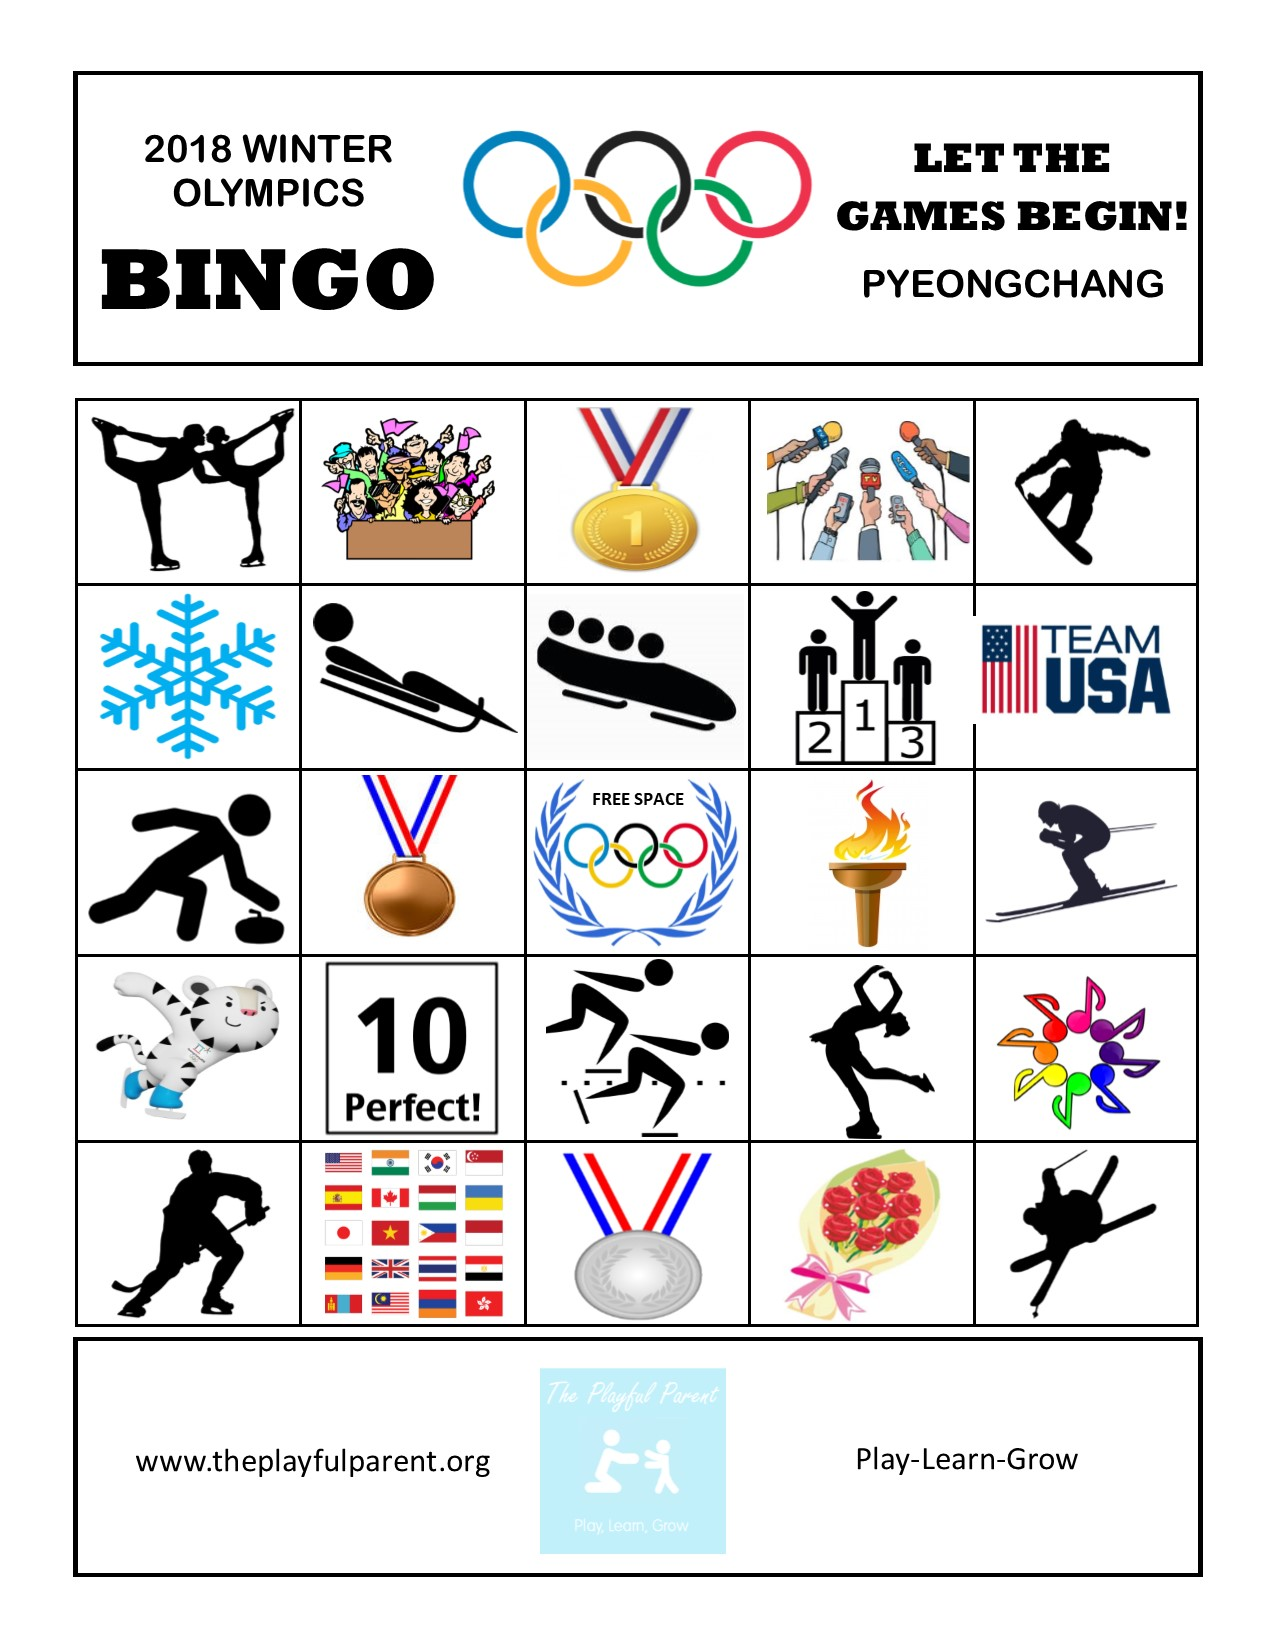 image regarding Winter Bingo Cards Free Printable named No cost PRINTABLE Winter season OLYMPIC BINGO